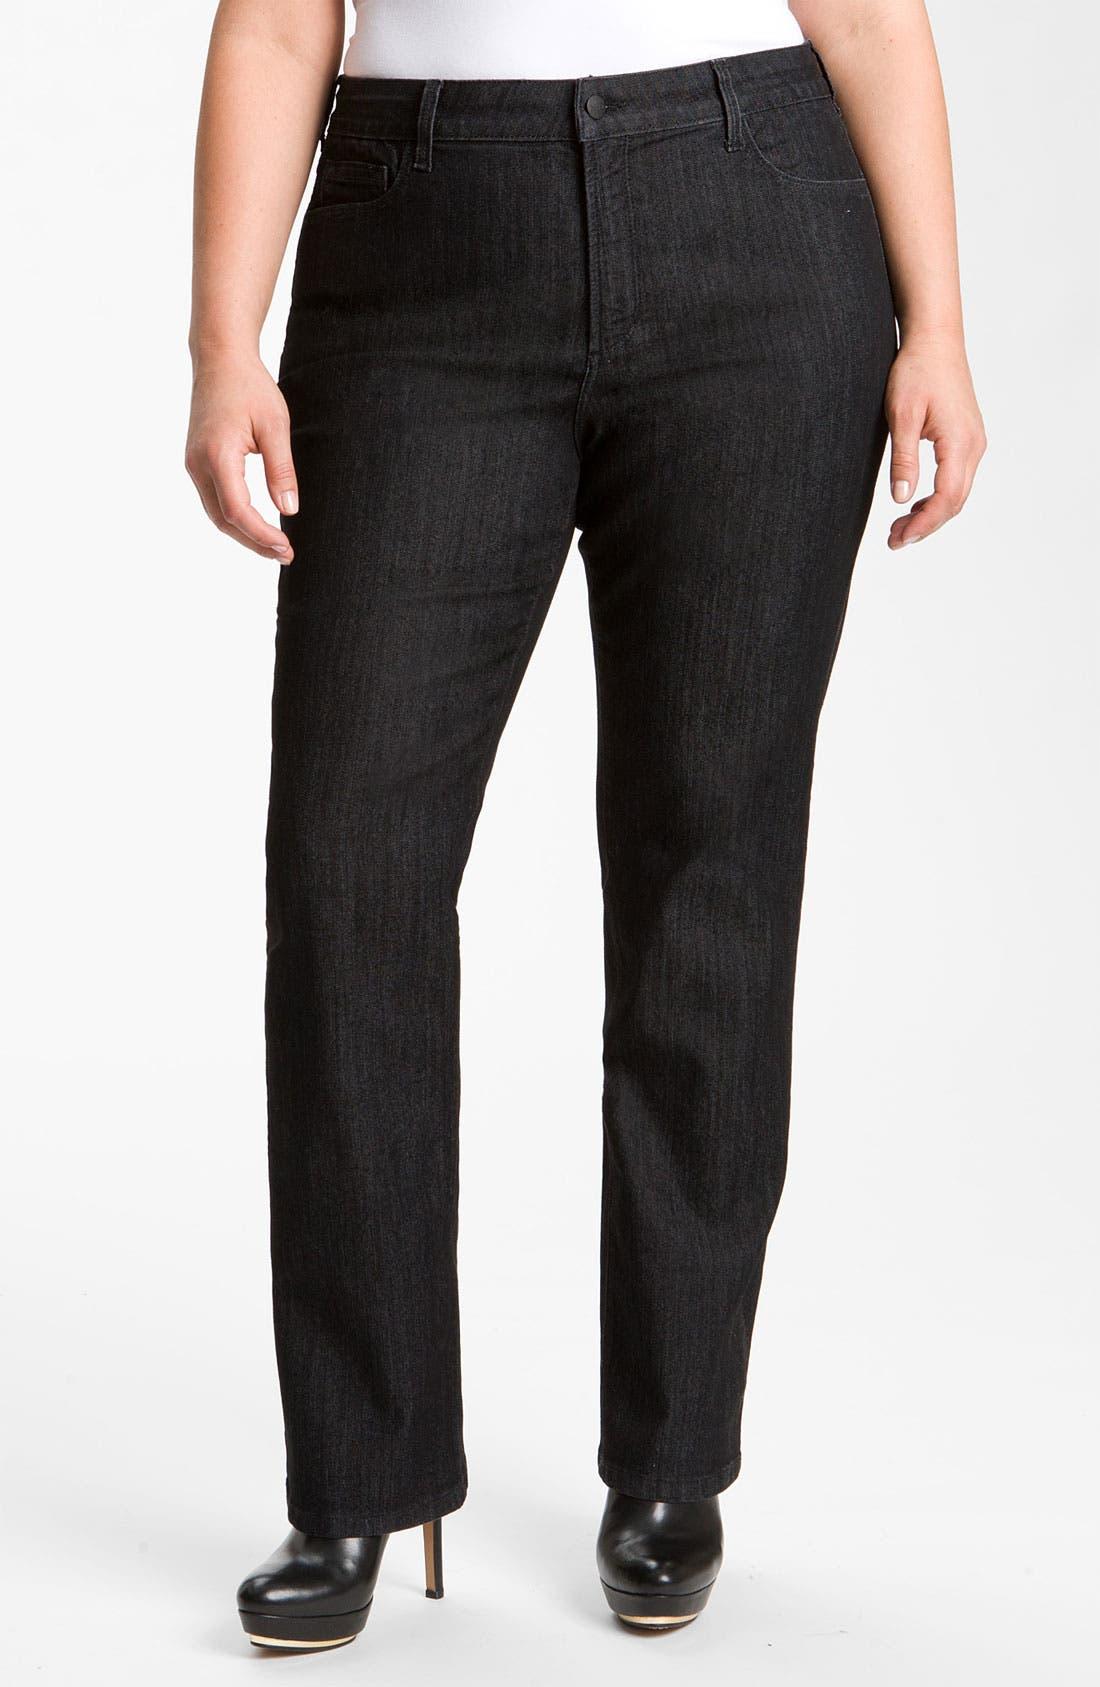 Main Image - NYDJ 'Marilyn' Straight Leg Stretch Jeans (Plus)